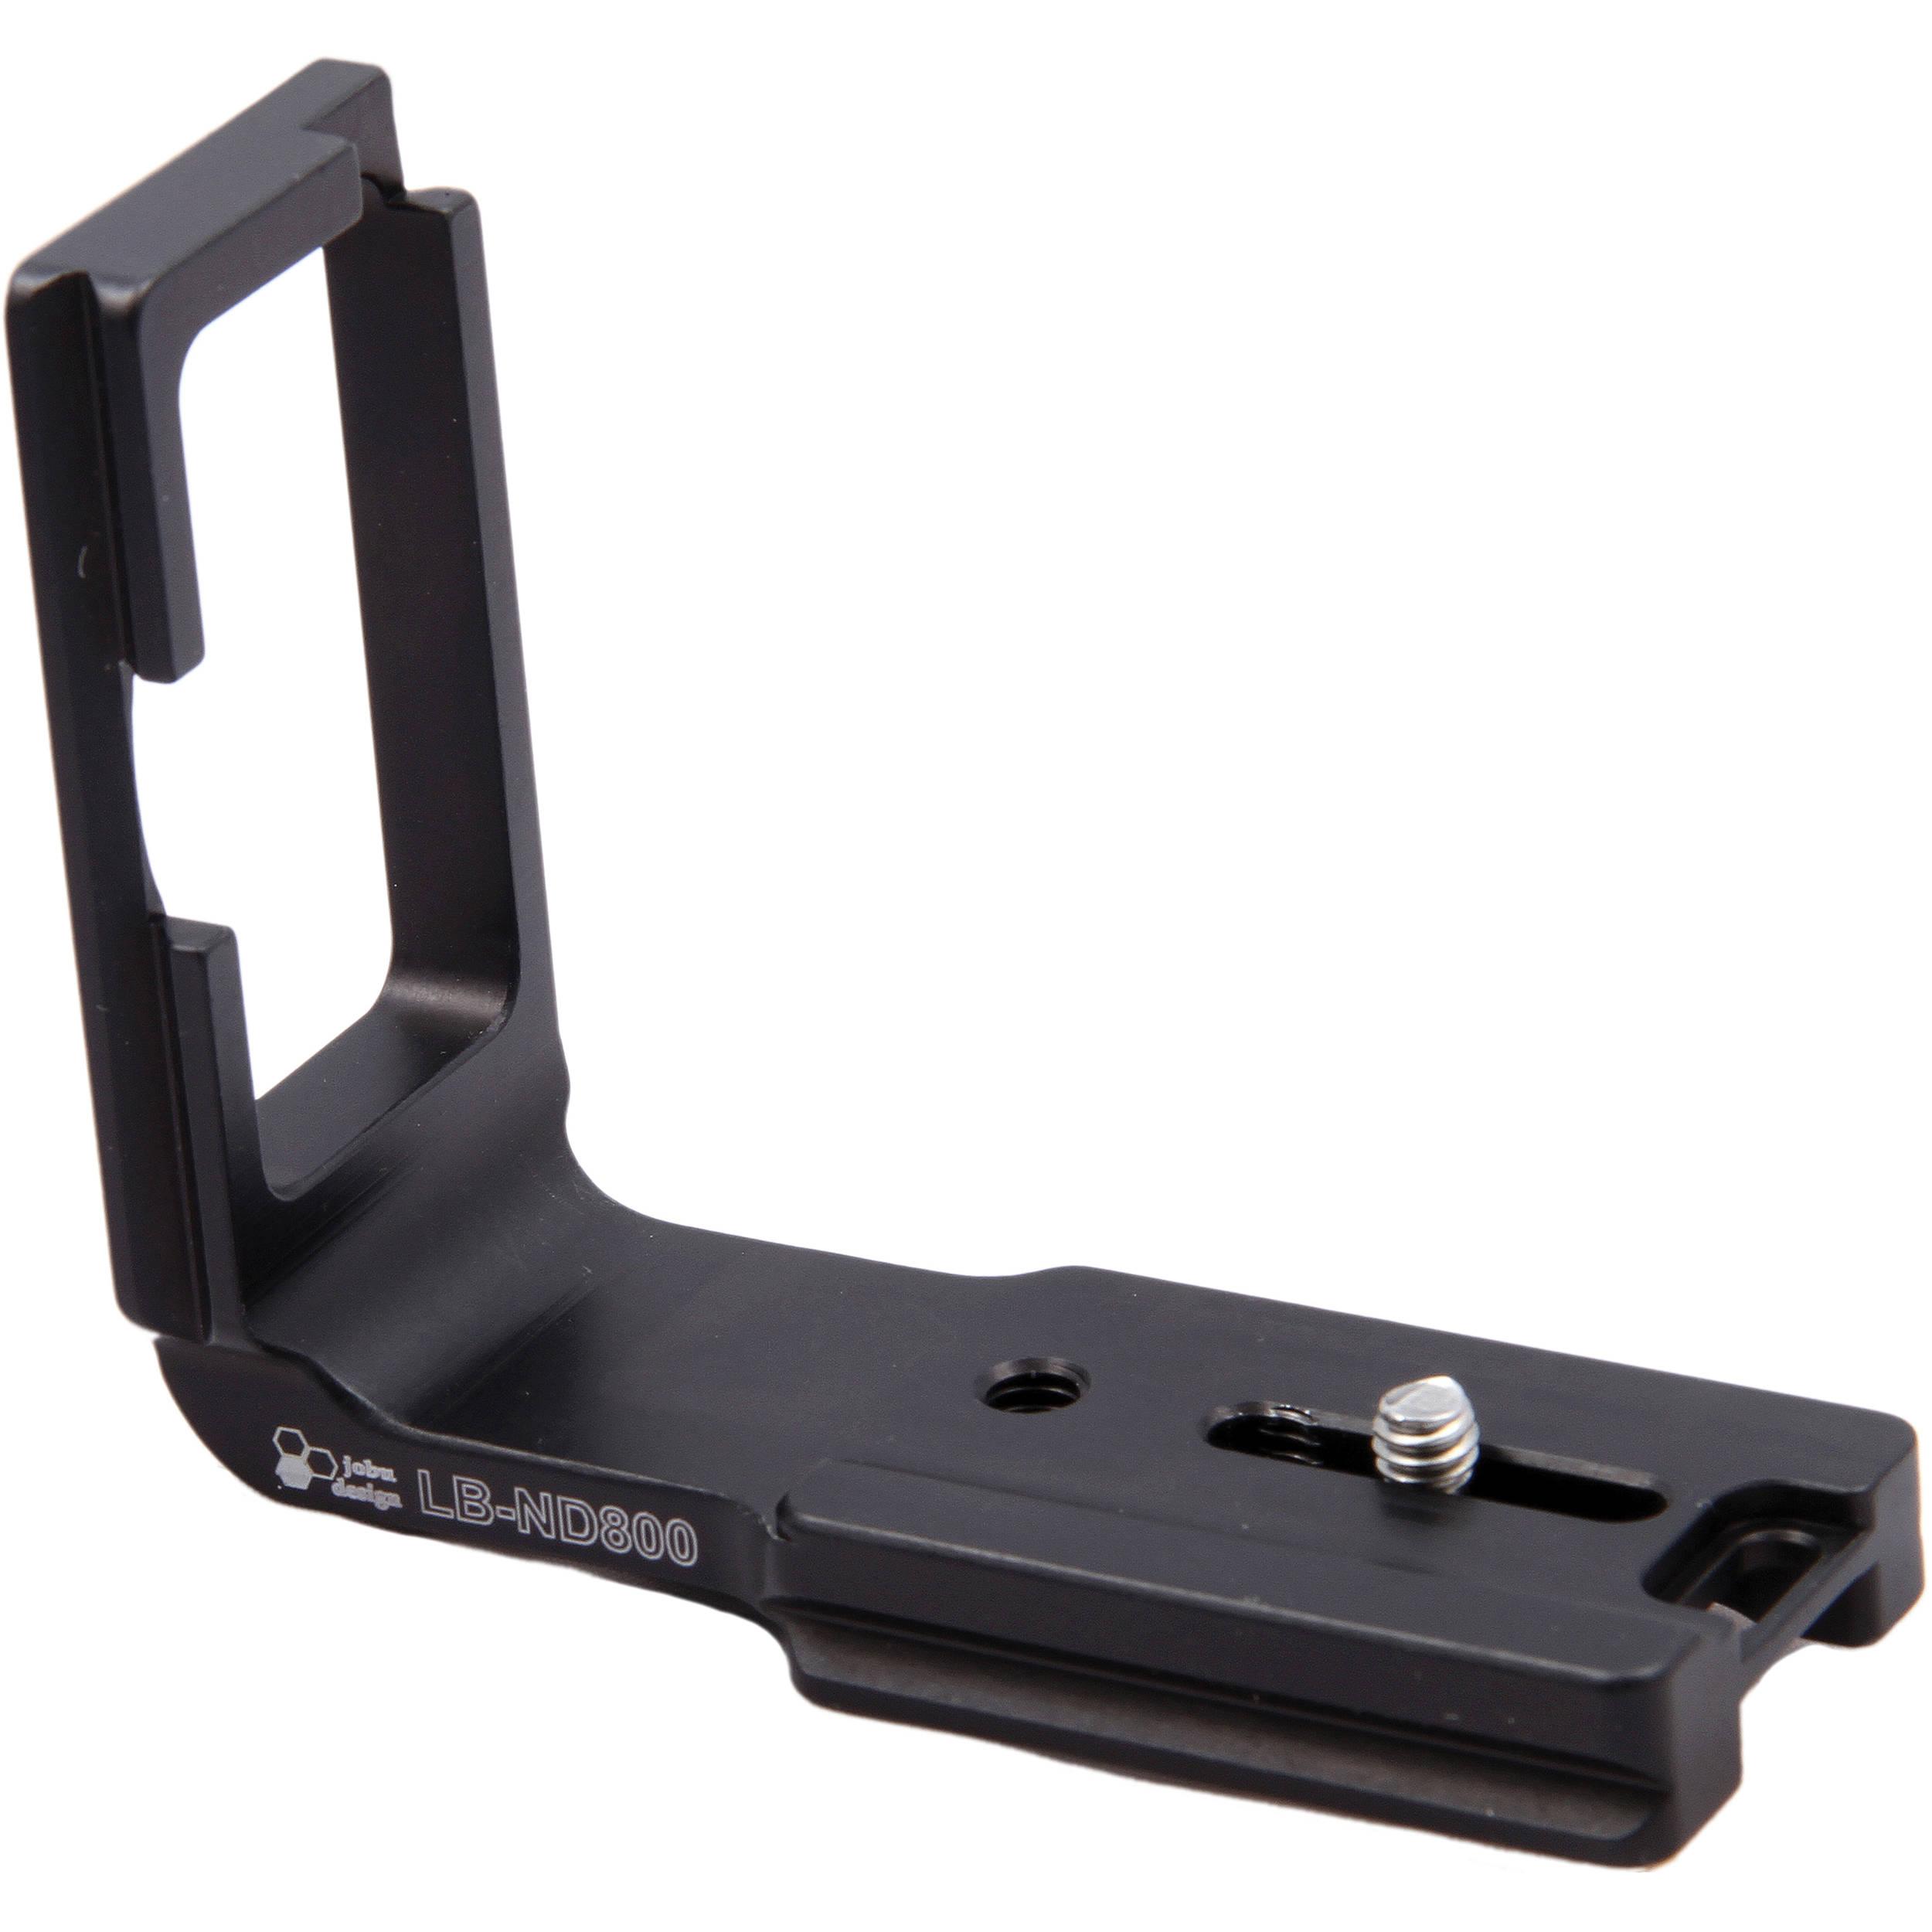 0f778aede12 Jobu Design L Bracket for Nikon D800 Without Battery LB-ND800